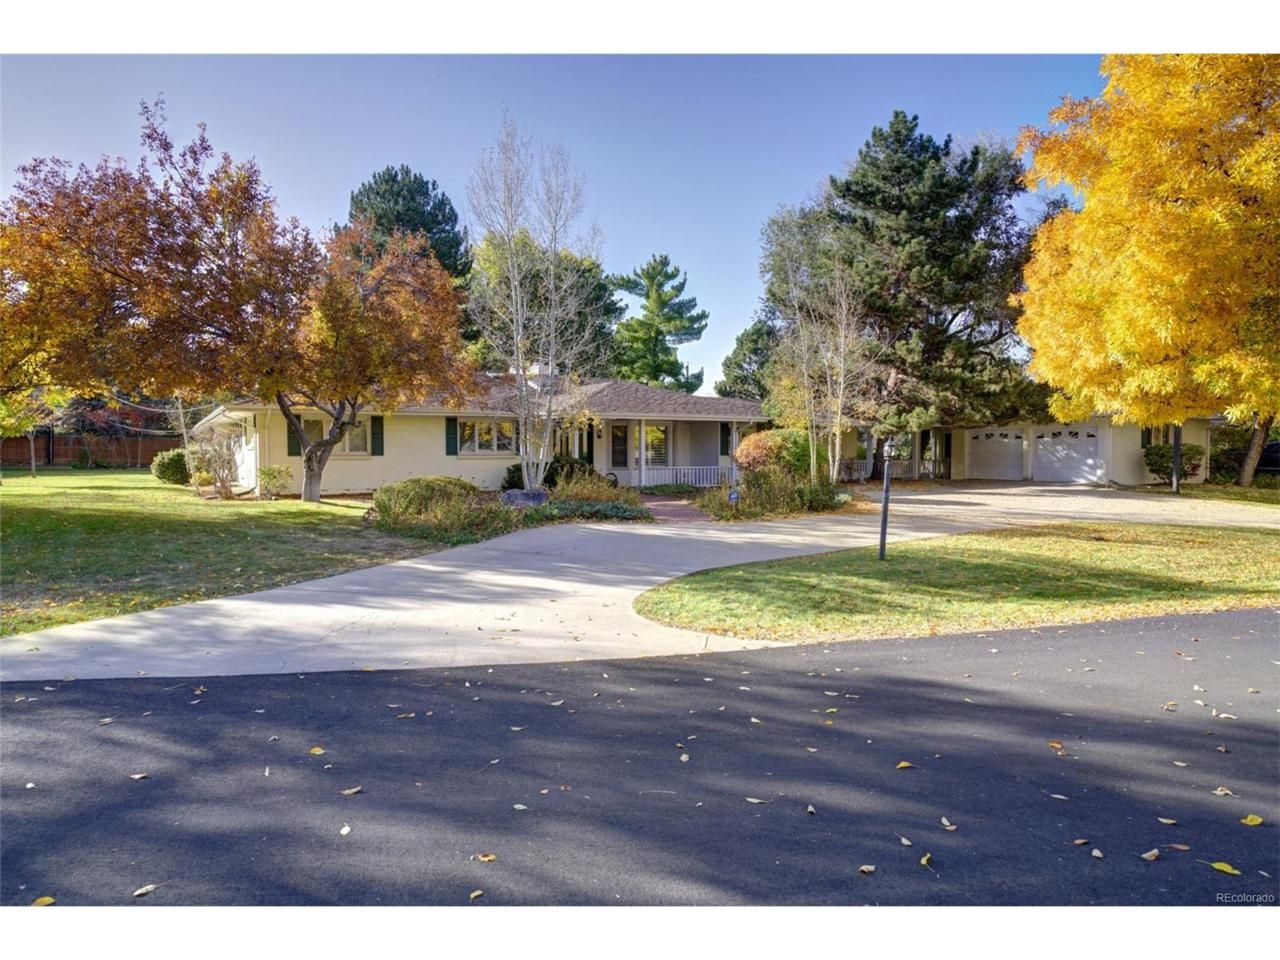 3131 Cherryridge Road, Cherry Hills Village, CO 80113 (MLS #7701800) :: 8z Real Estate